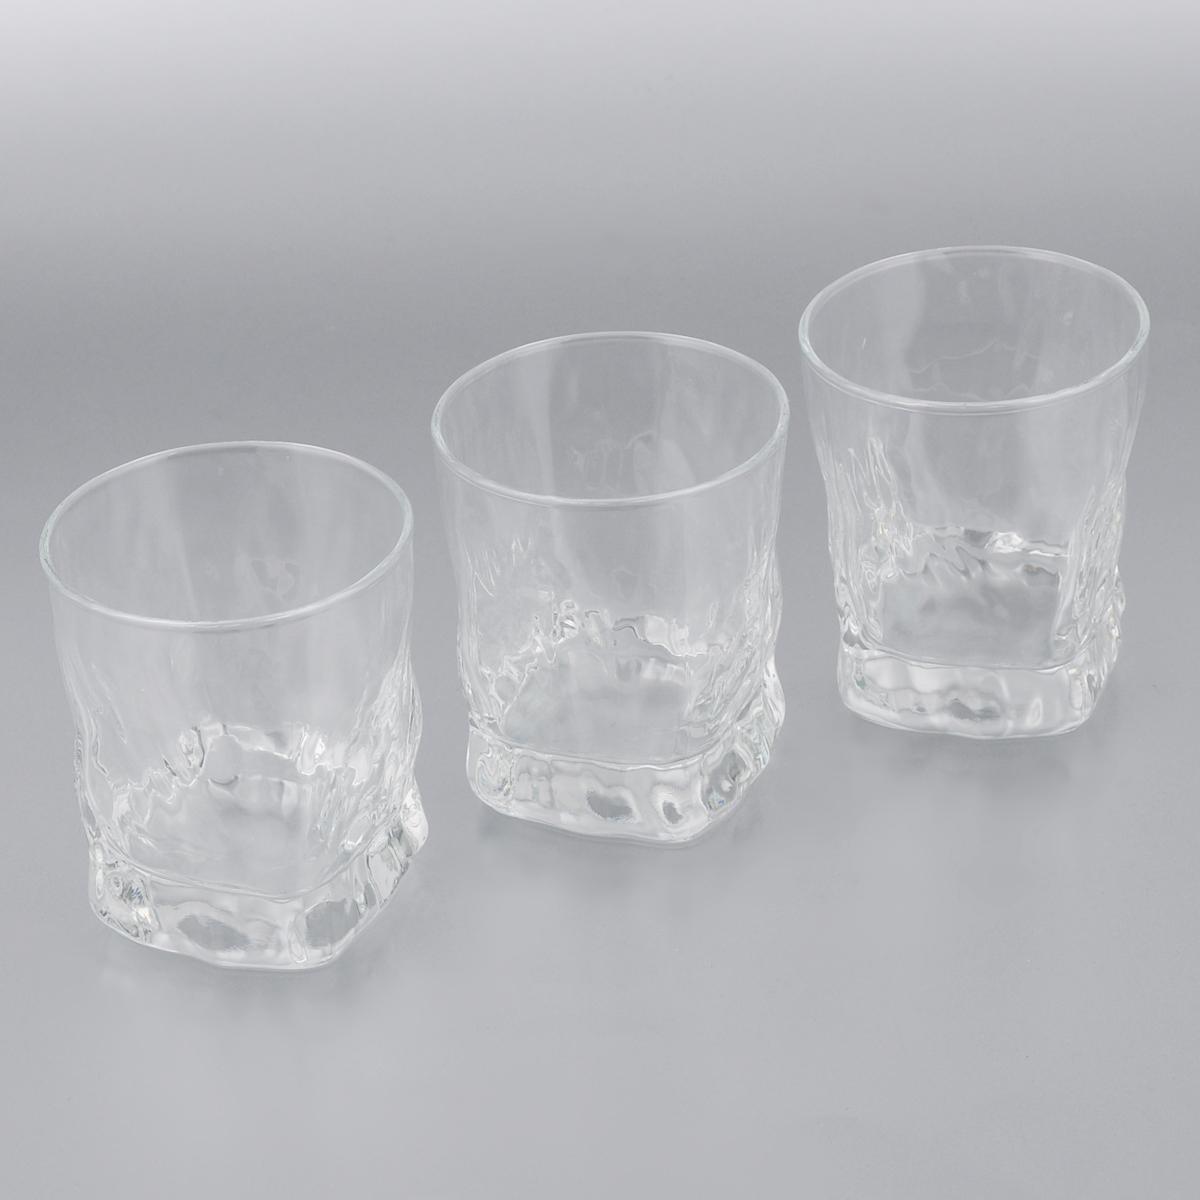 Набор стаканов Luminarc Icy, 300 мл, 3 шт набор стаканов 6шт 300 мл